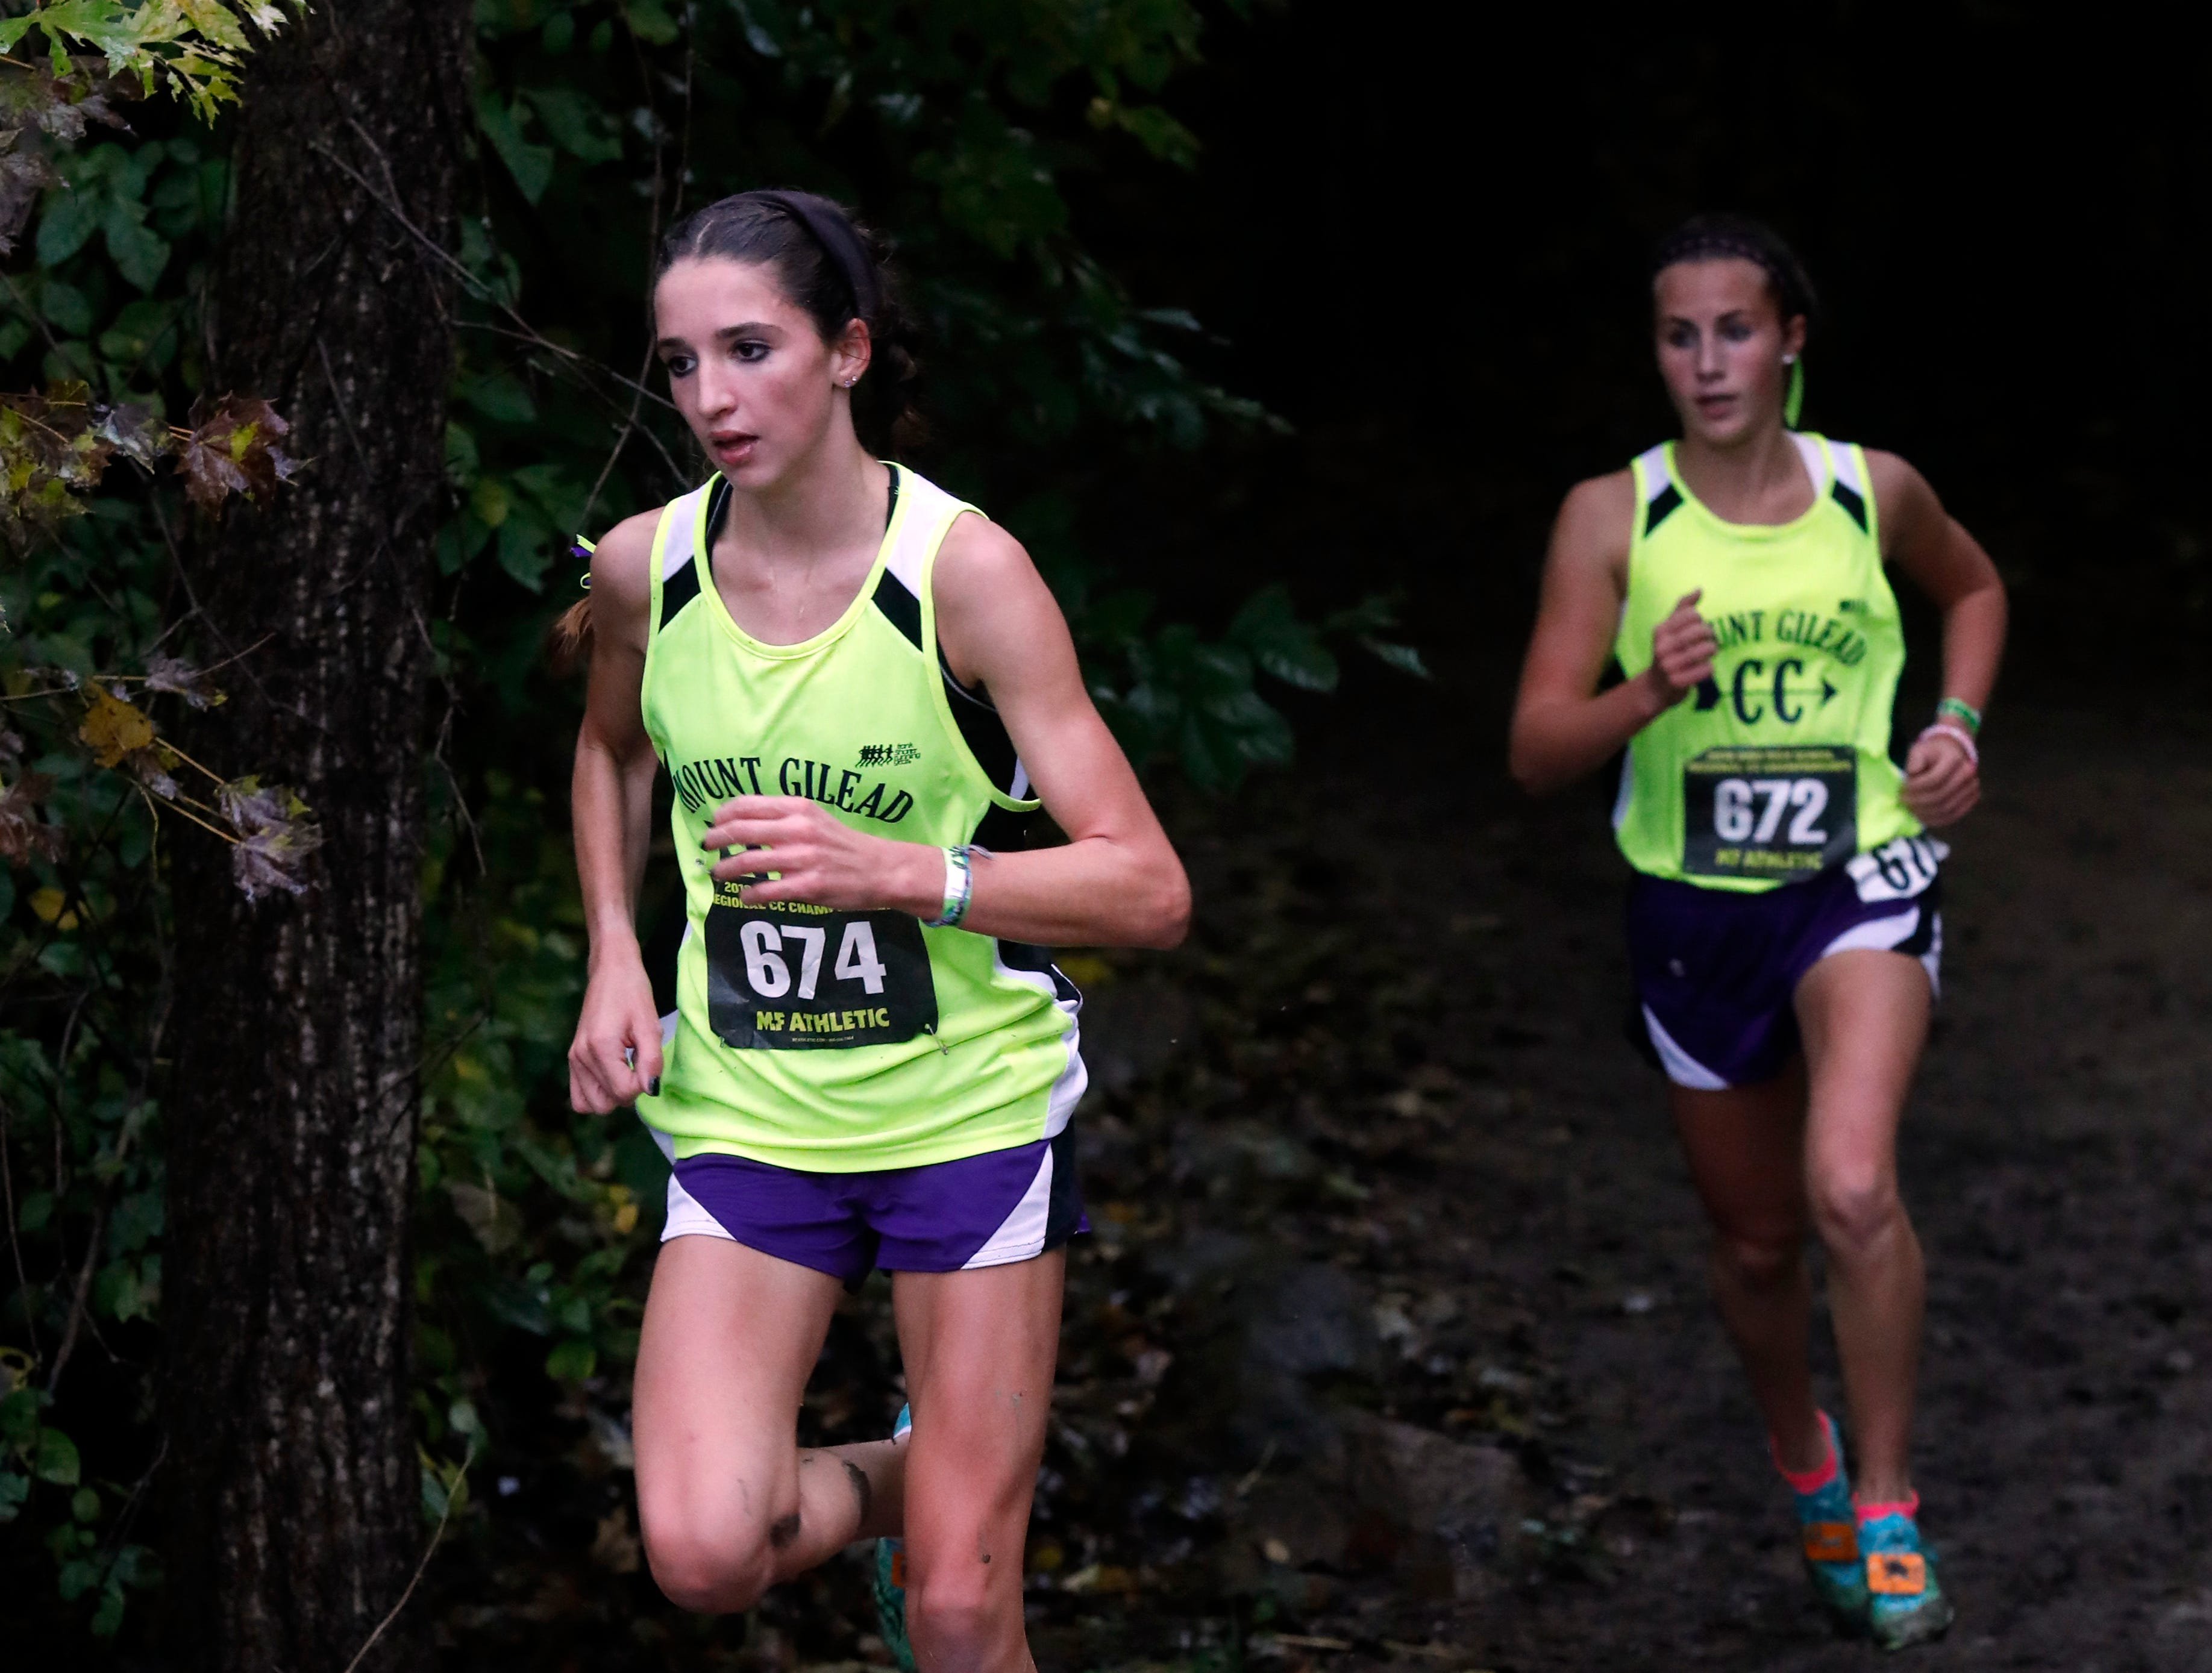 Mount Gilead's Allison Johnson, left, and Baylee Hack run in the Regional Cross Country meet Saturday, Oct. 27, 2018, at Pickerington North High School in Pickerington.